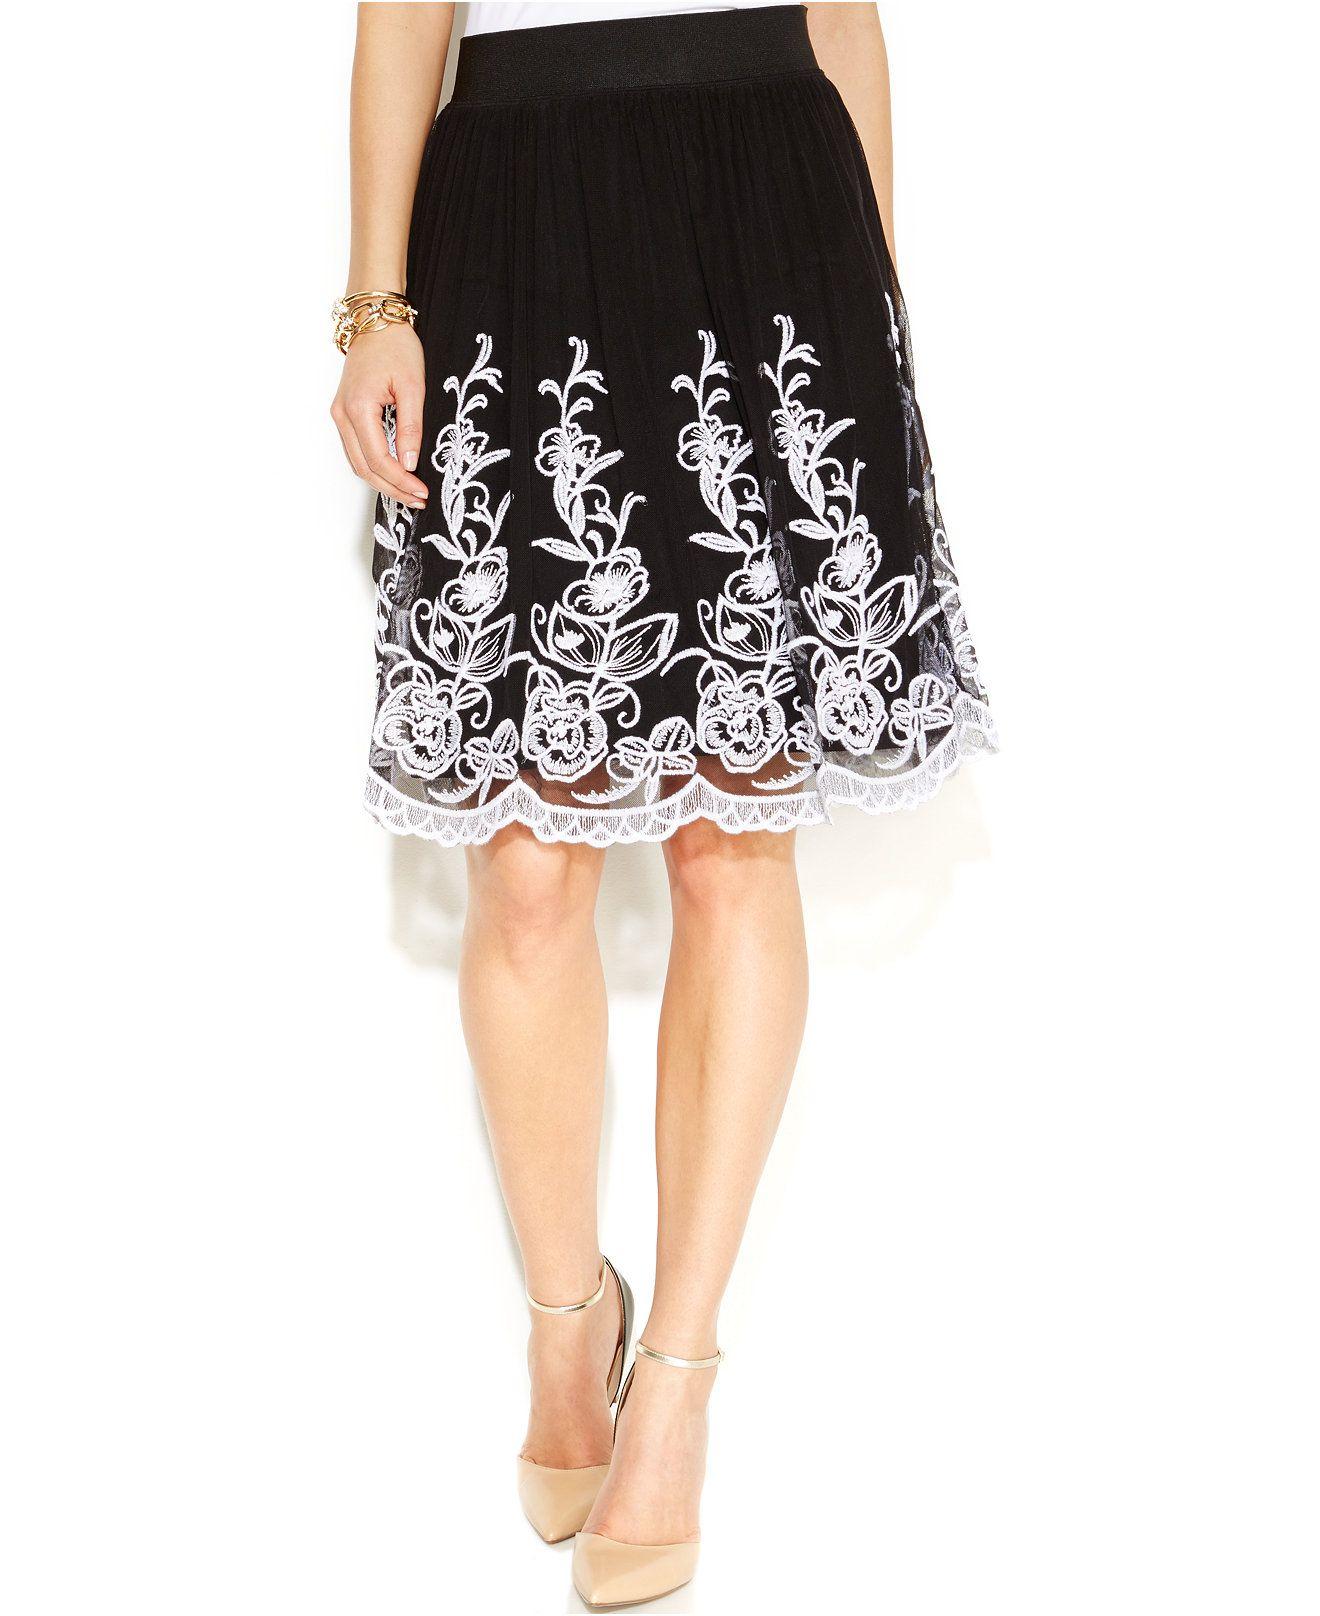 1f4ec2fdc Women's Clothing Store - Macy's White Oaks - Springfield, IL